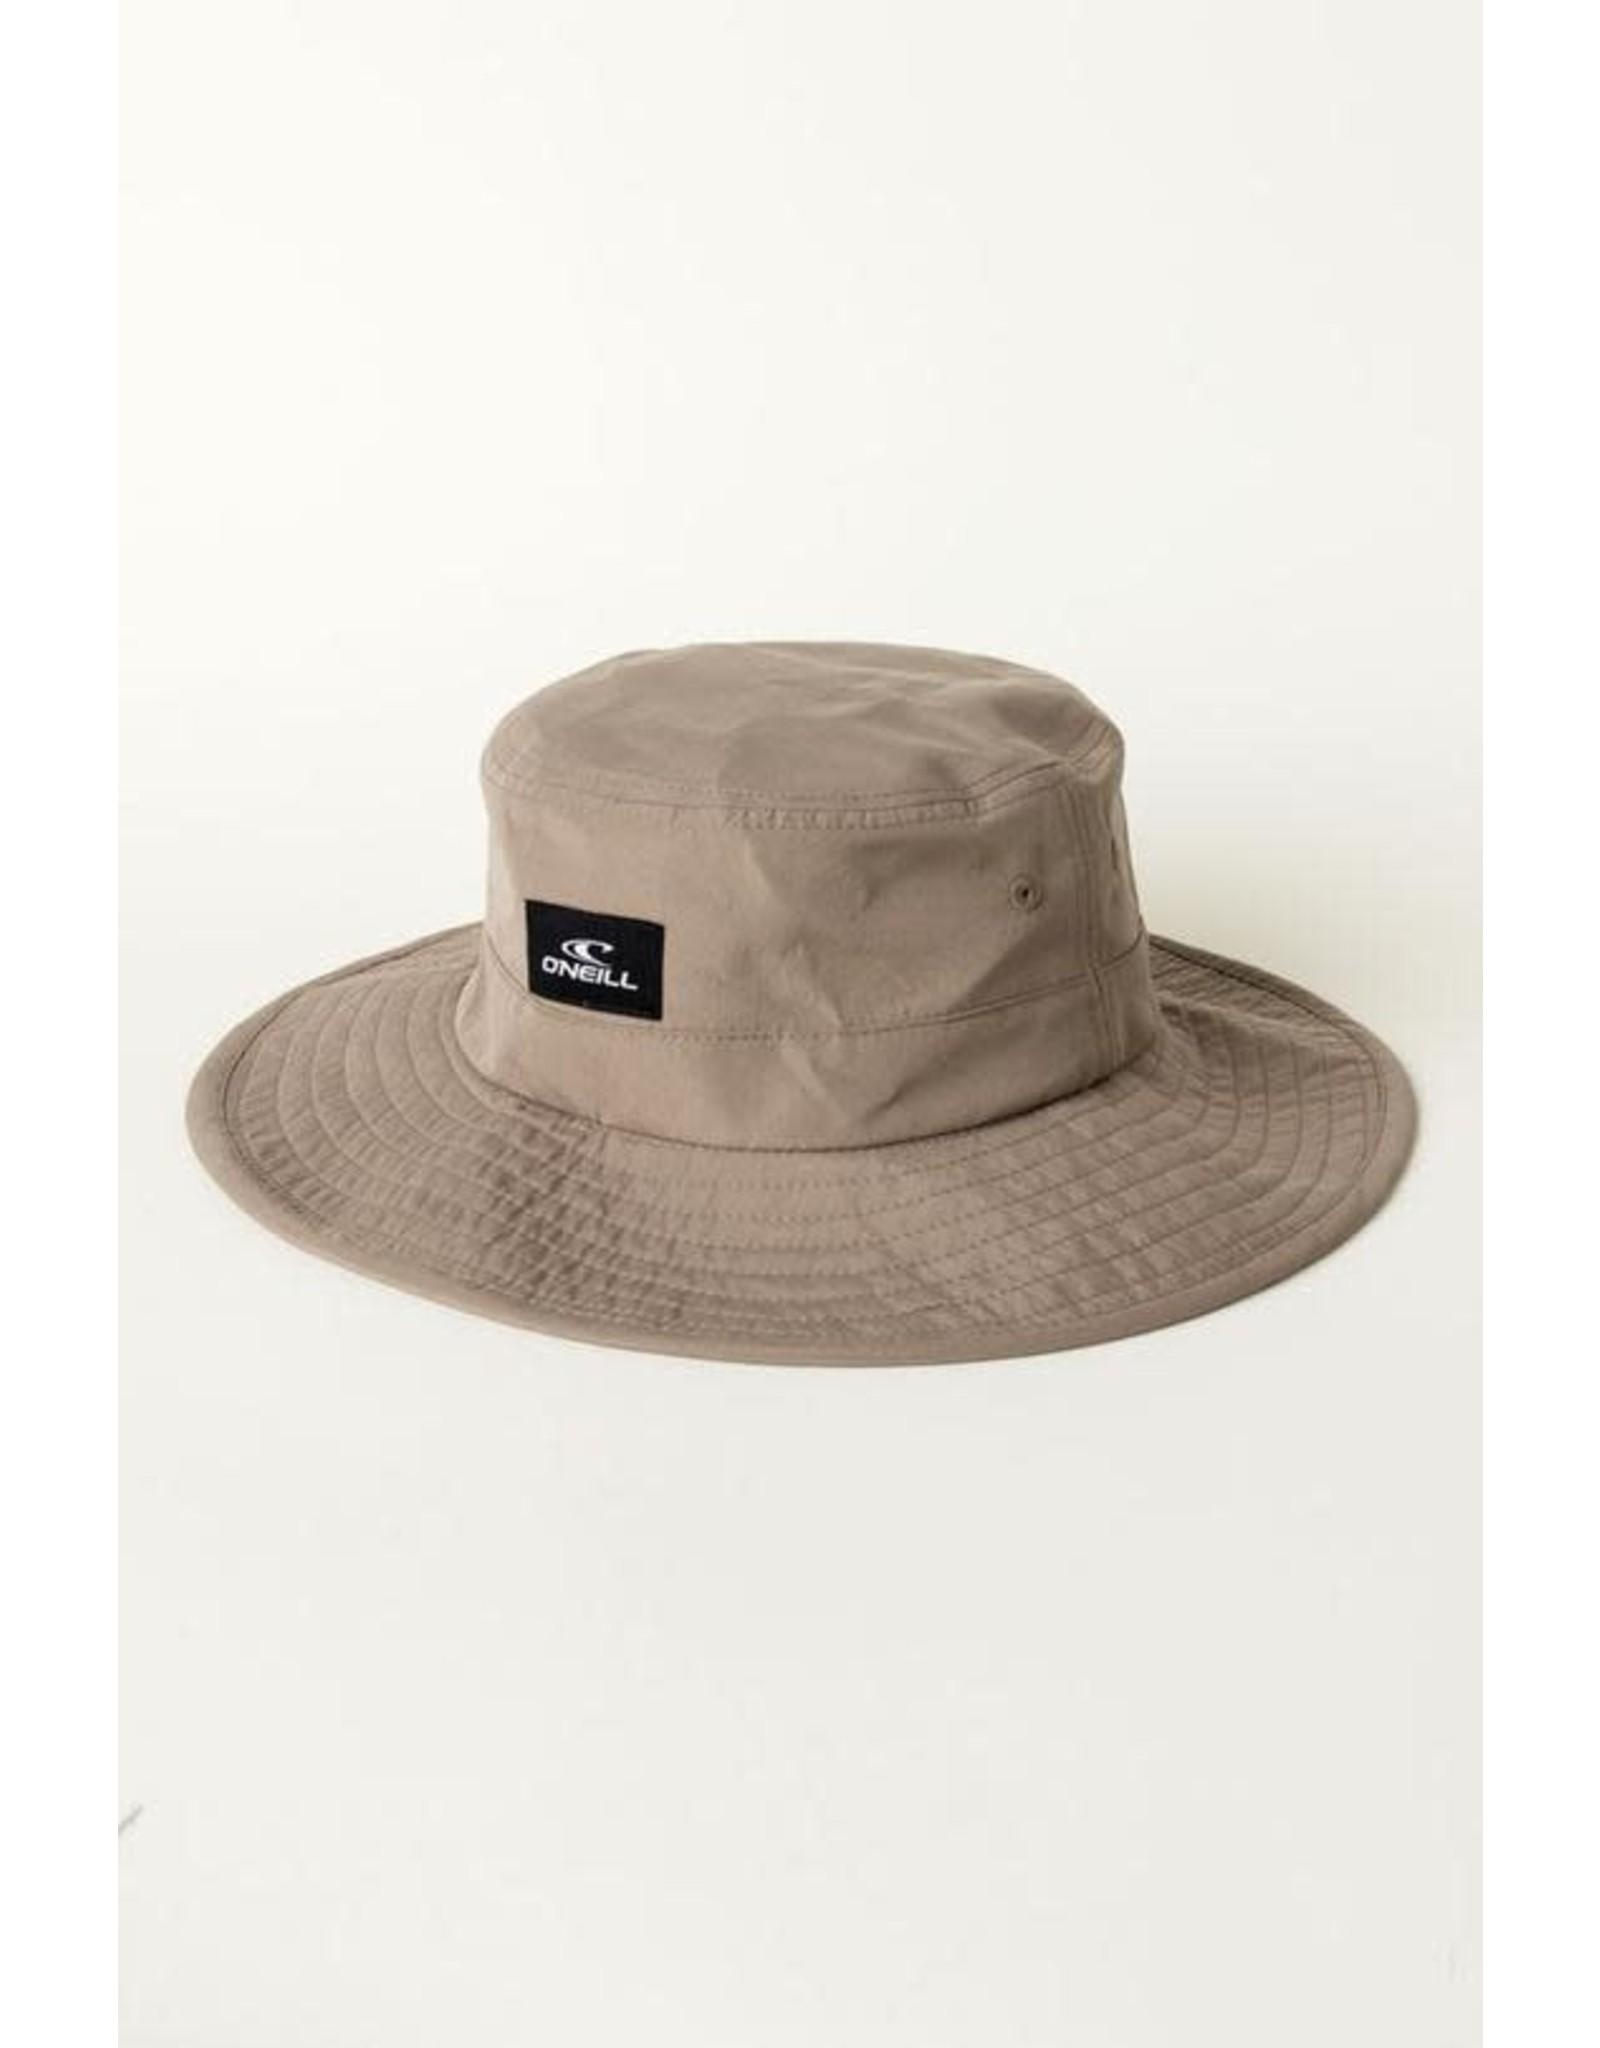 O'NEILL Wetlands Hat